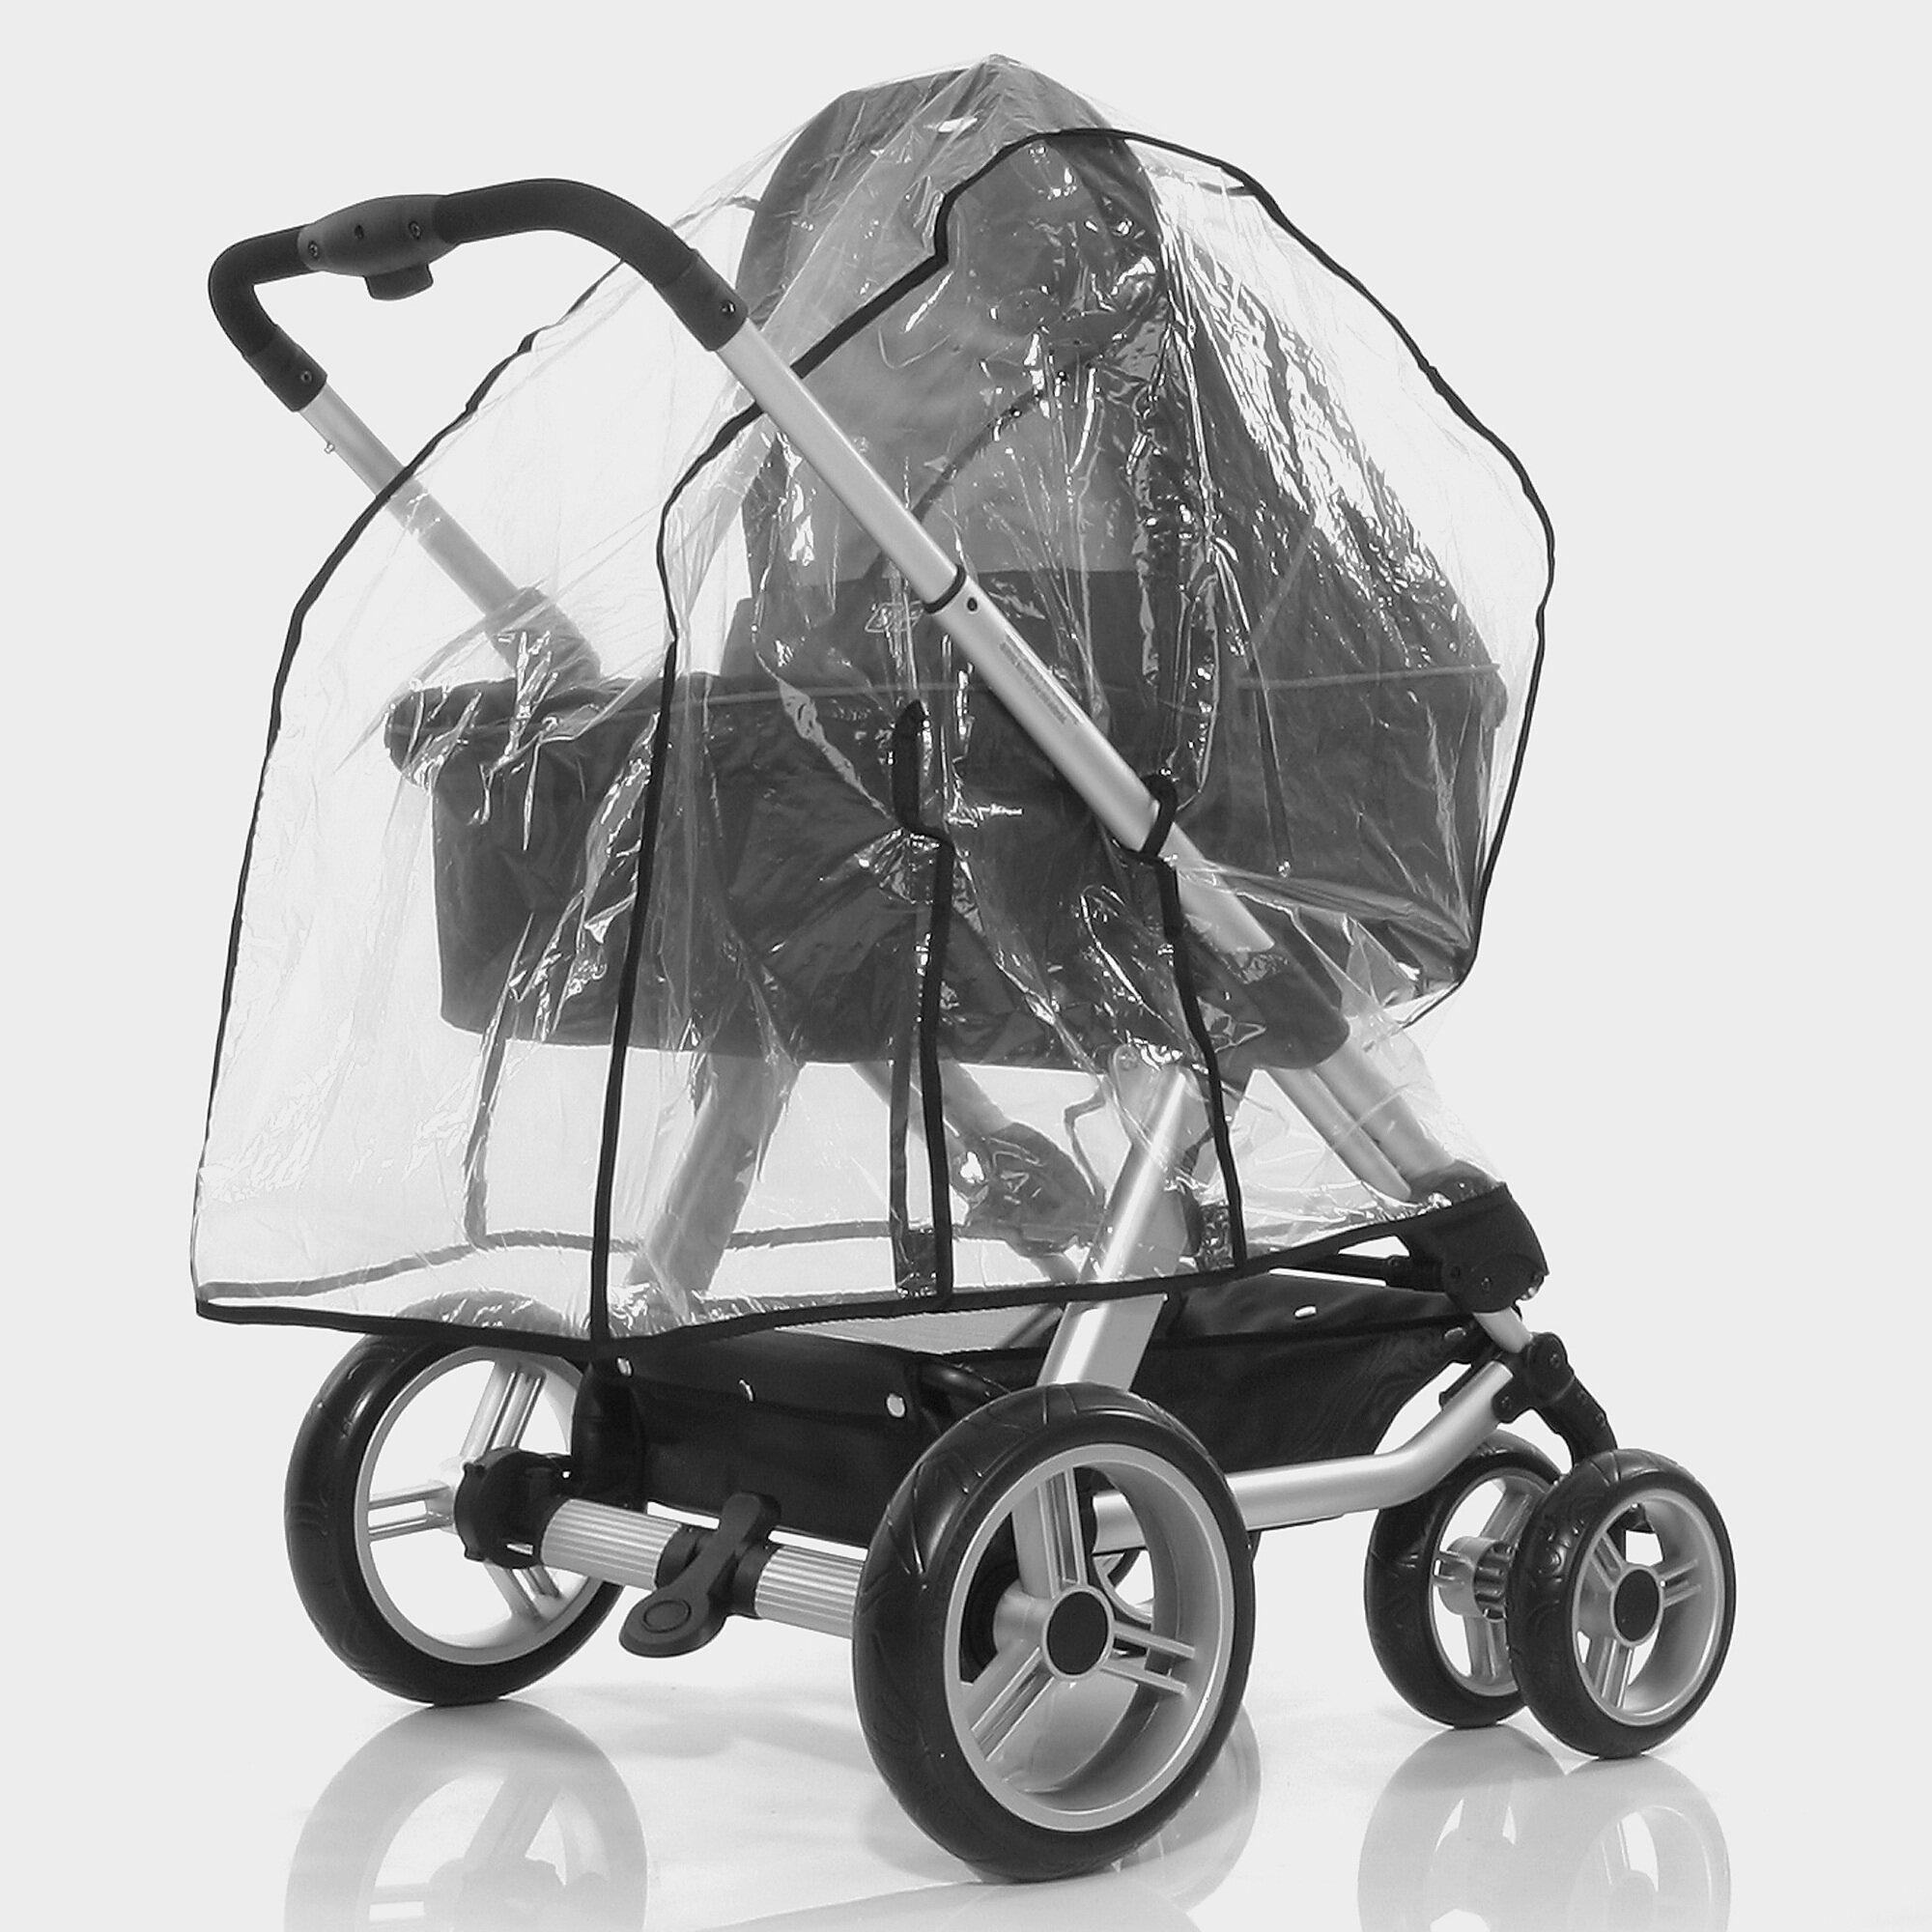 abc-design-regenschutz-multi-fur-salsa-tereno-viper-condor-4-turbo-4-turbo-6-tec-transparent